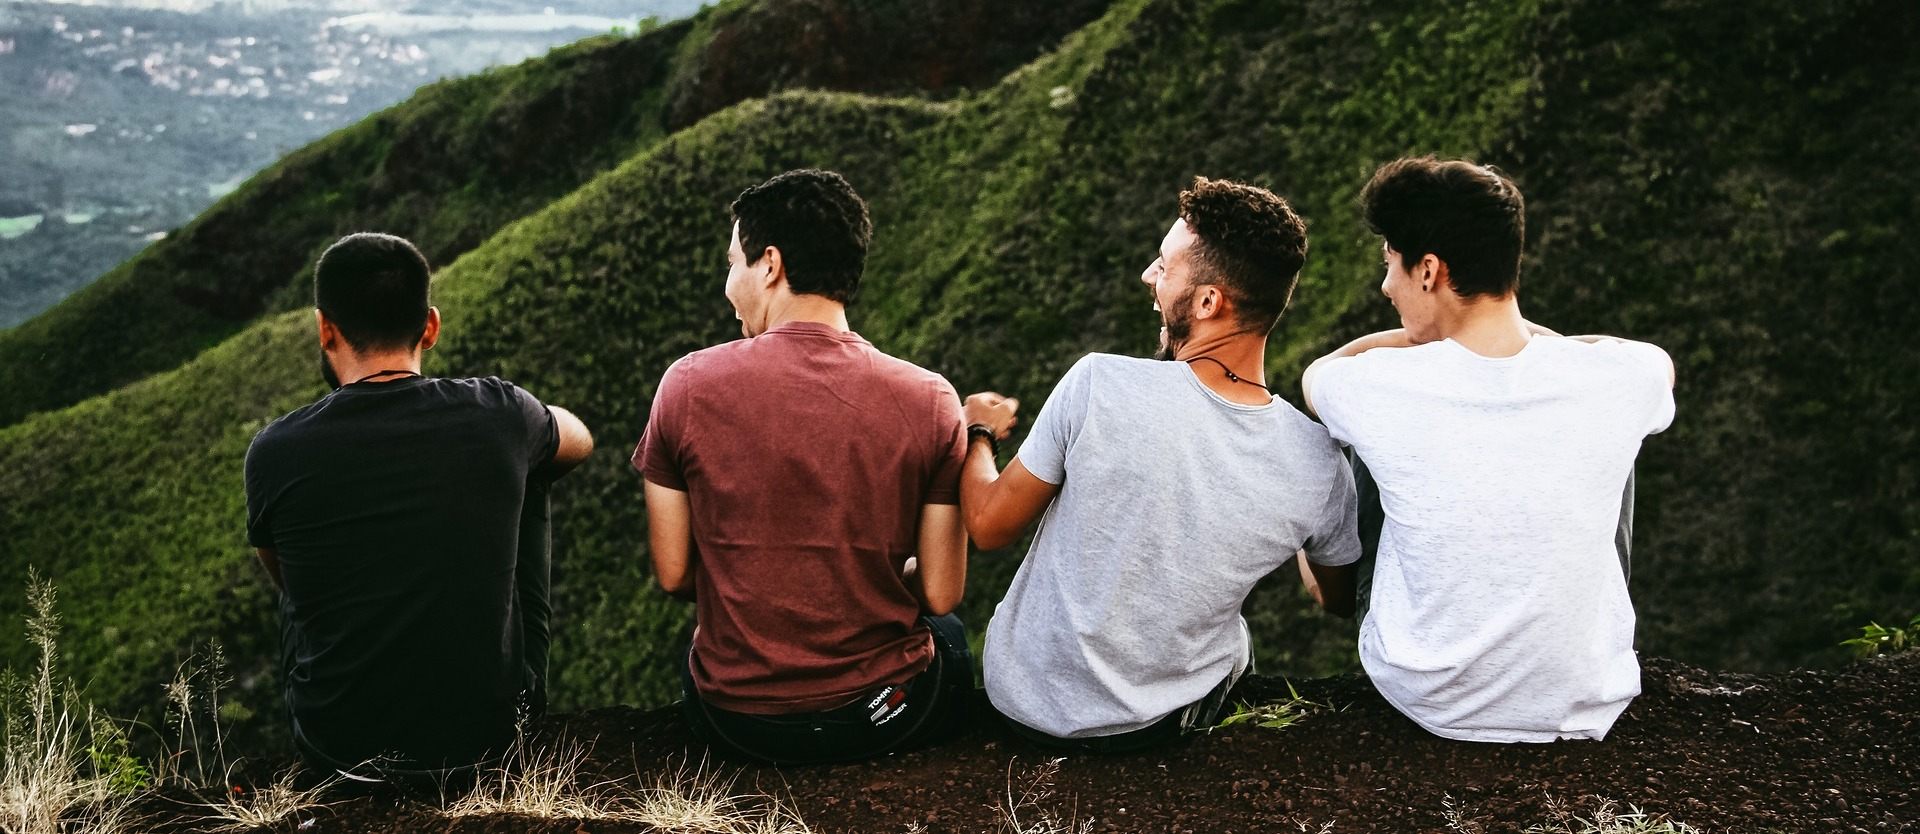 Guys on the mountain